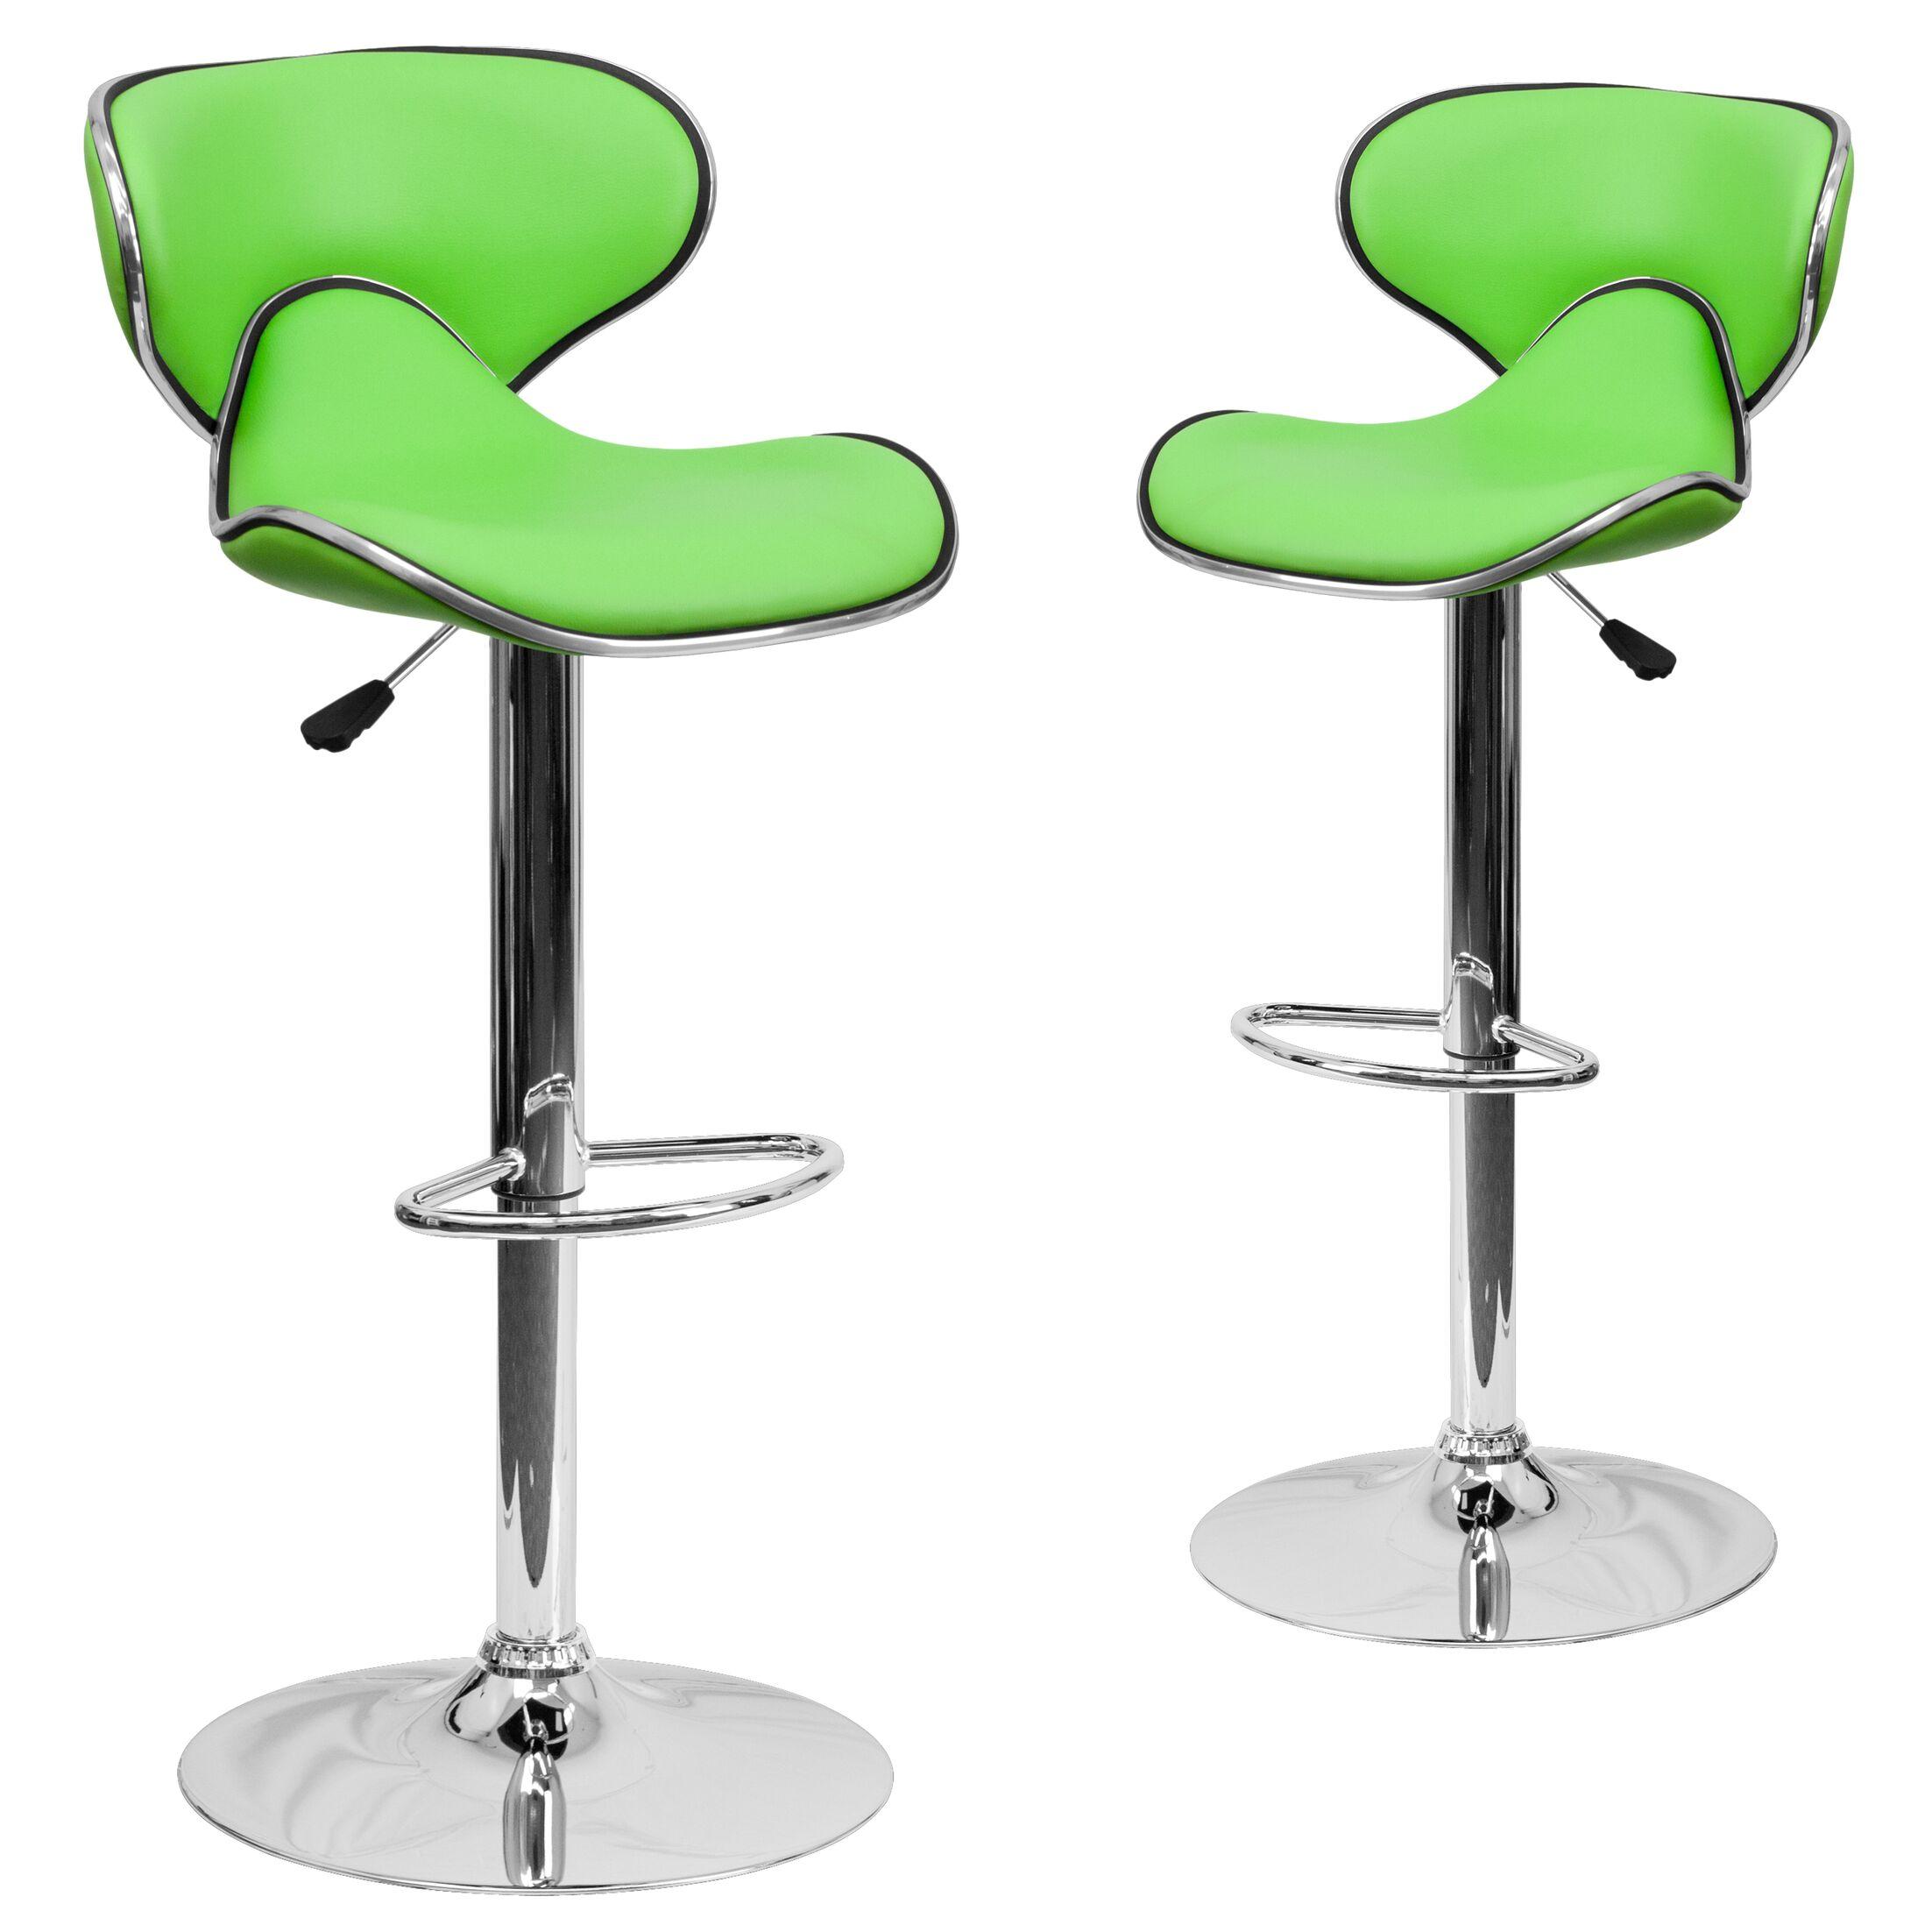 Preston Adjustable Height Swivel Bar Stool Upholstery: Green